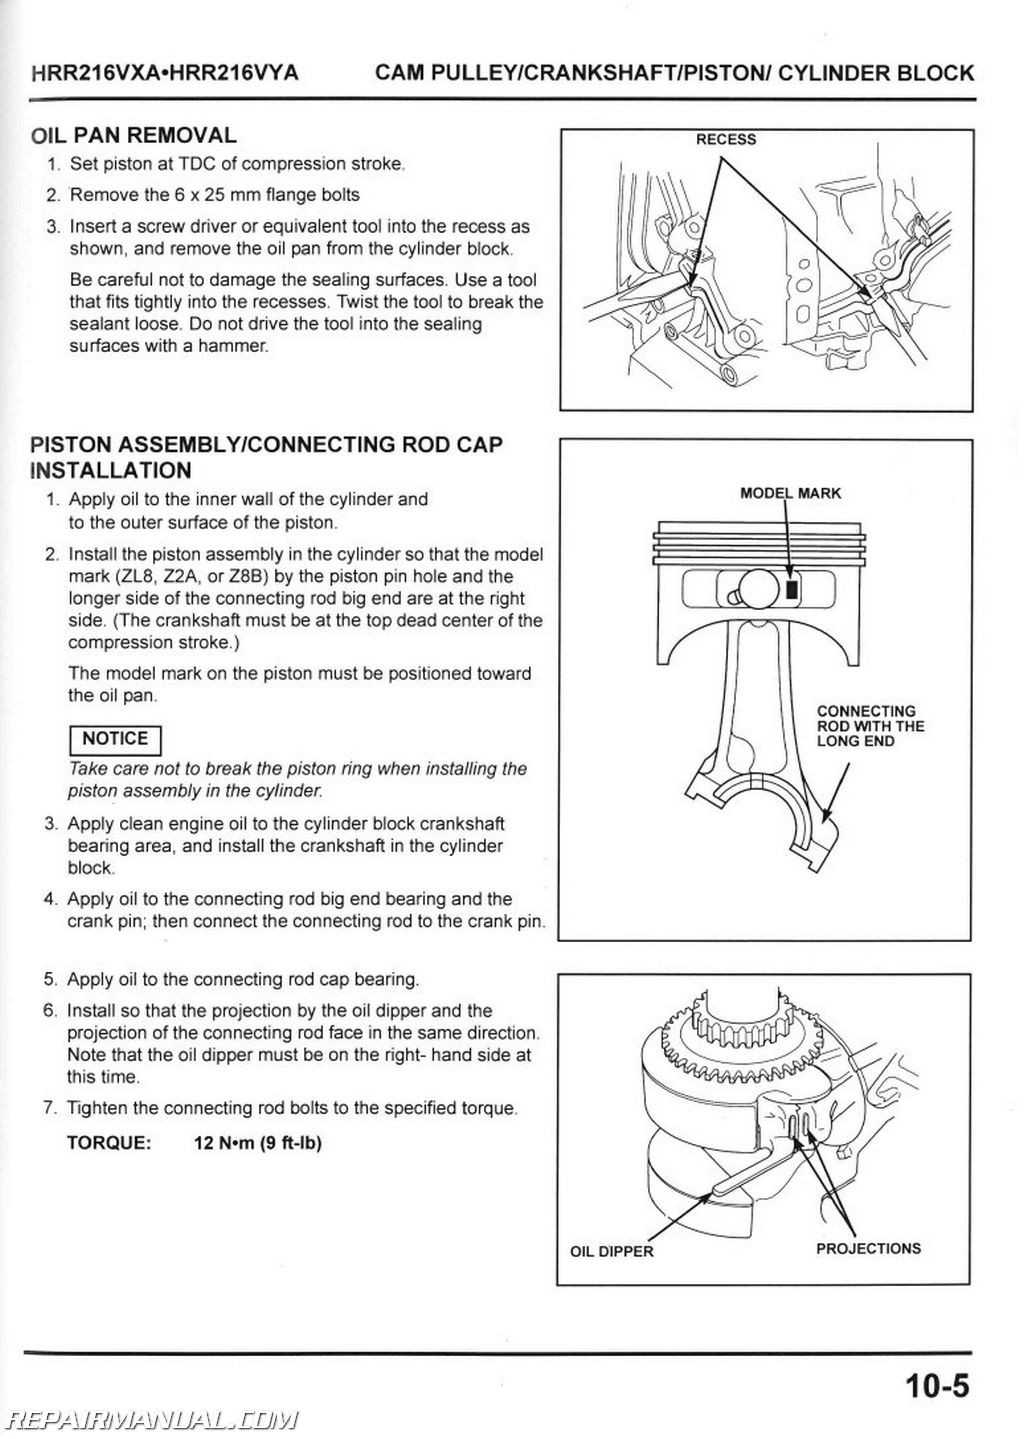 honda hrr216vxa hrr216vya service manual rh repairmanual com honda hrr216vxa repair manual Honda HRR216VXA Clutch Assembly